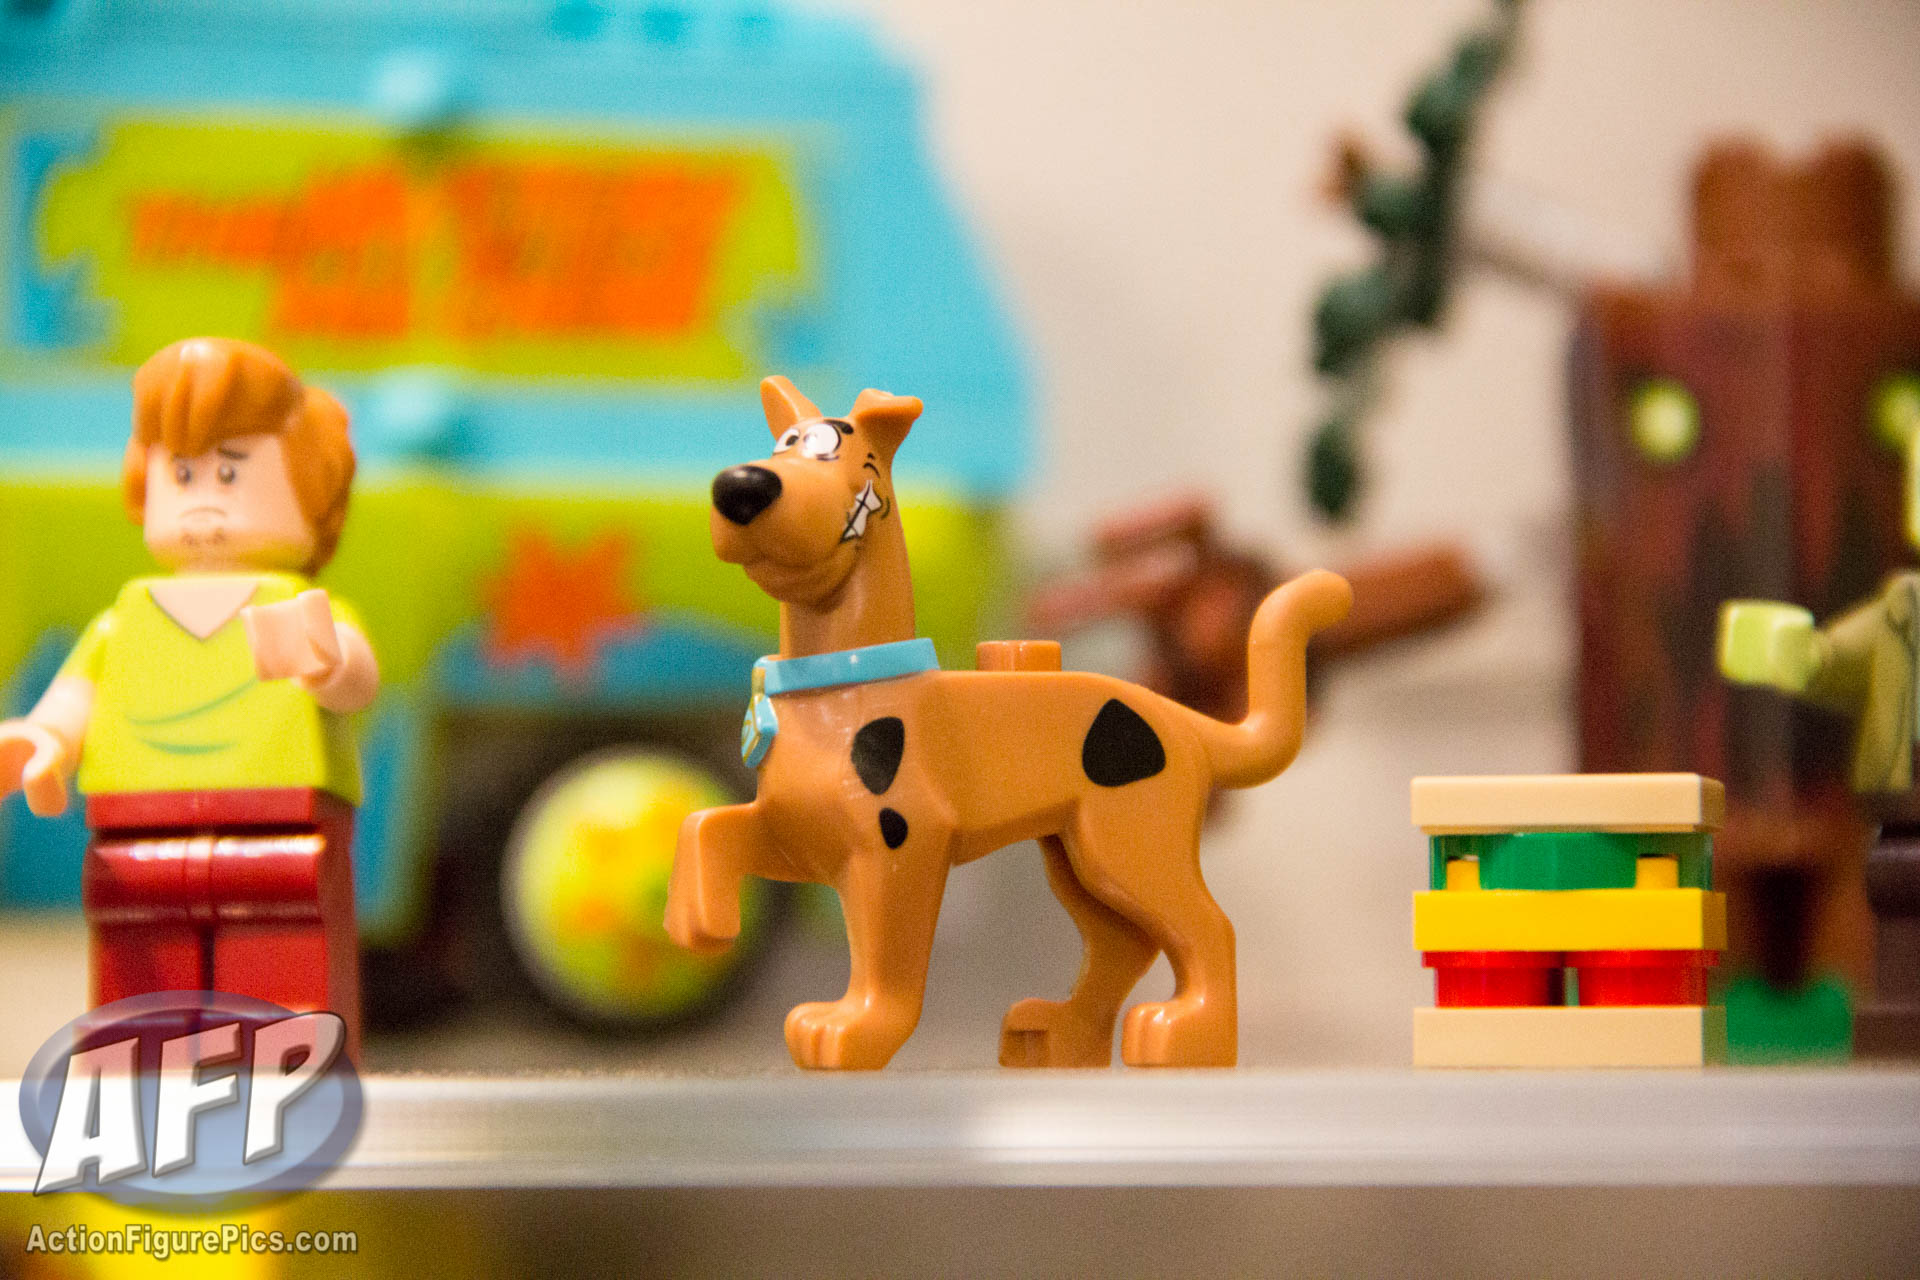 Toy Fair 2015: LEGO Minecraft and Scooby Doo - ActionFigurePics.com